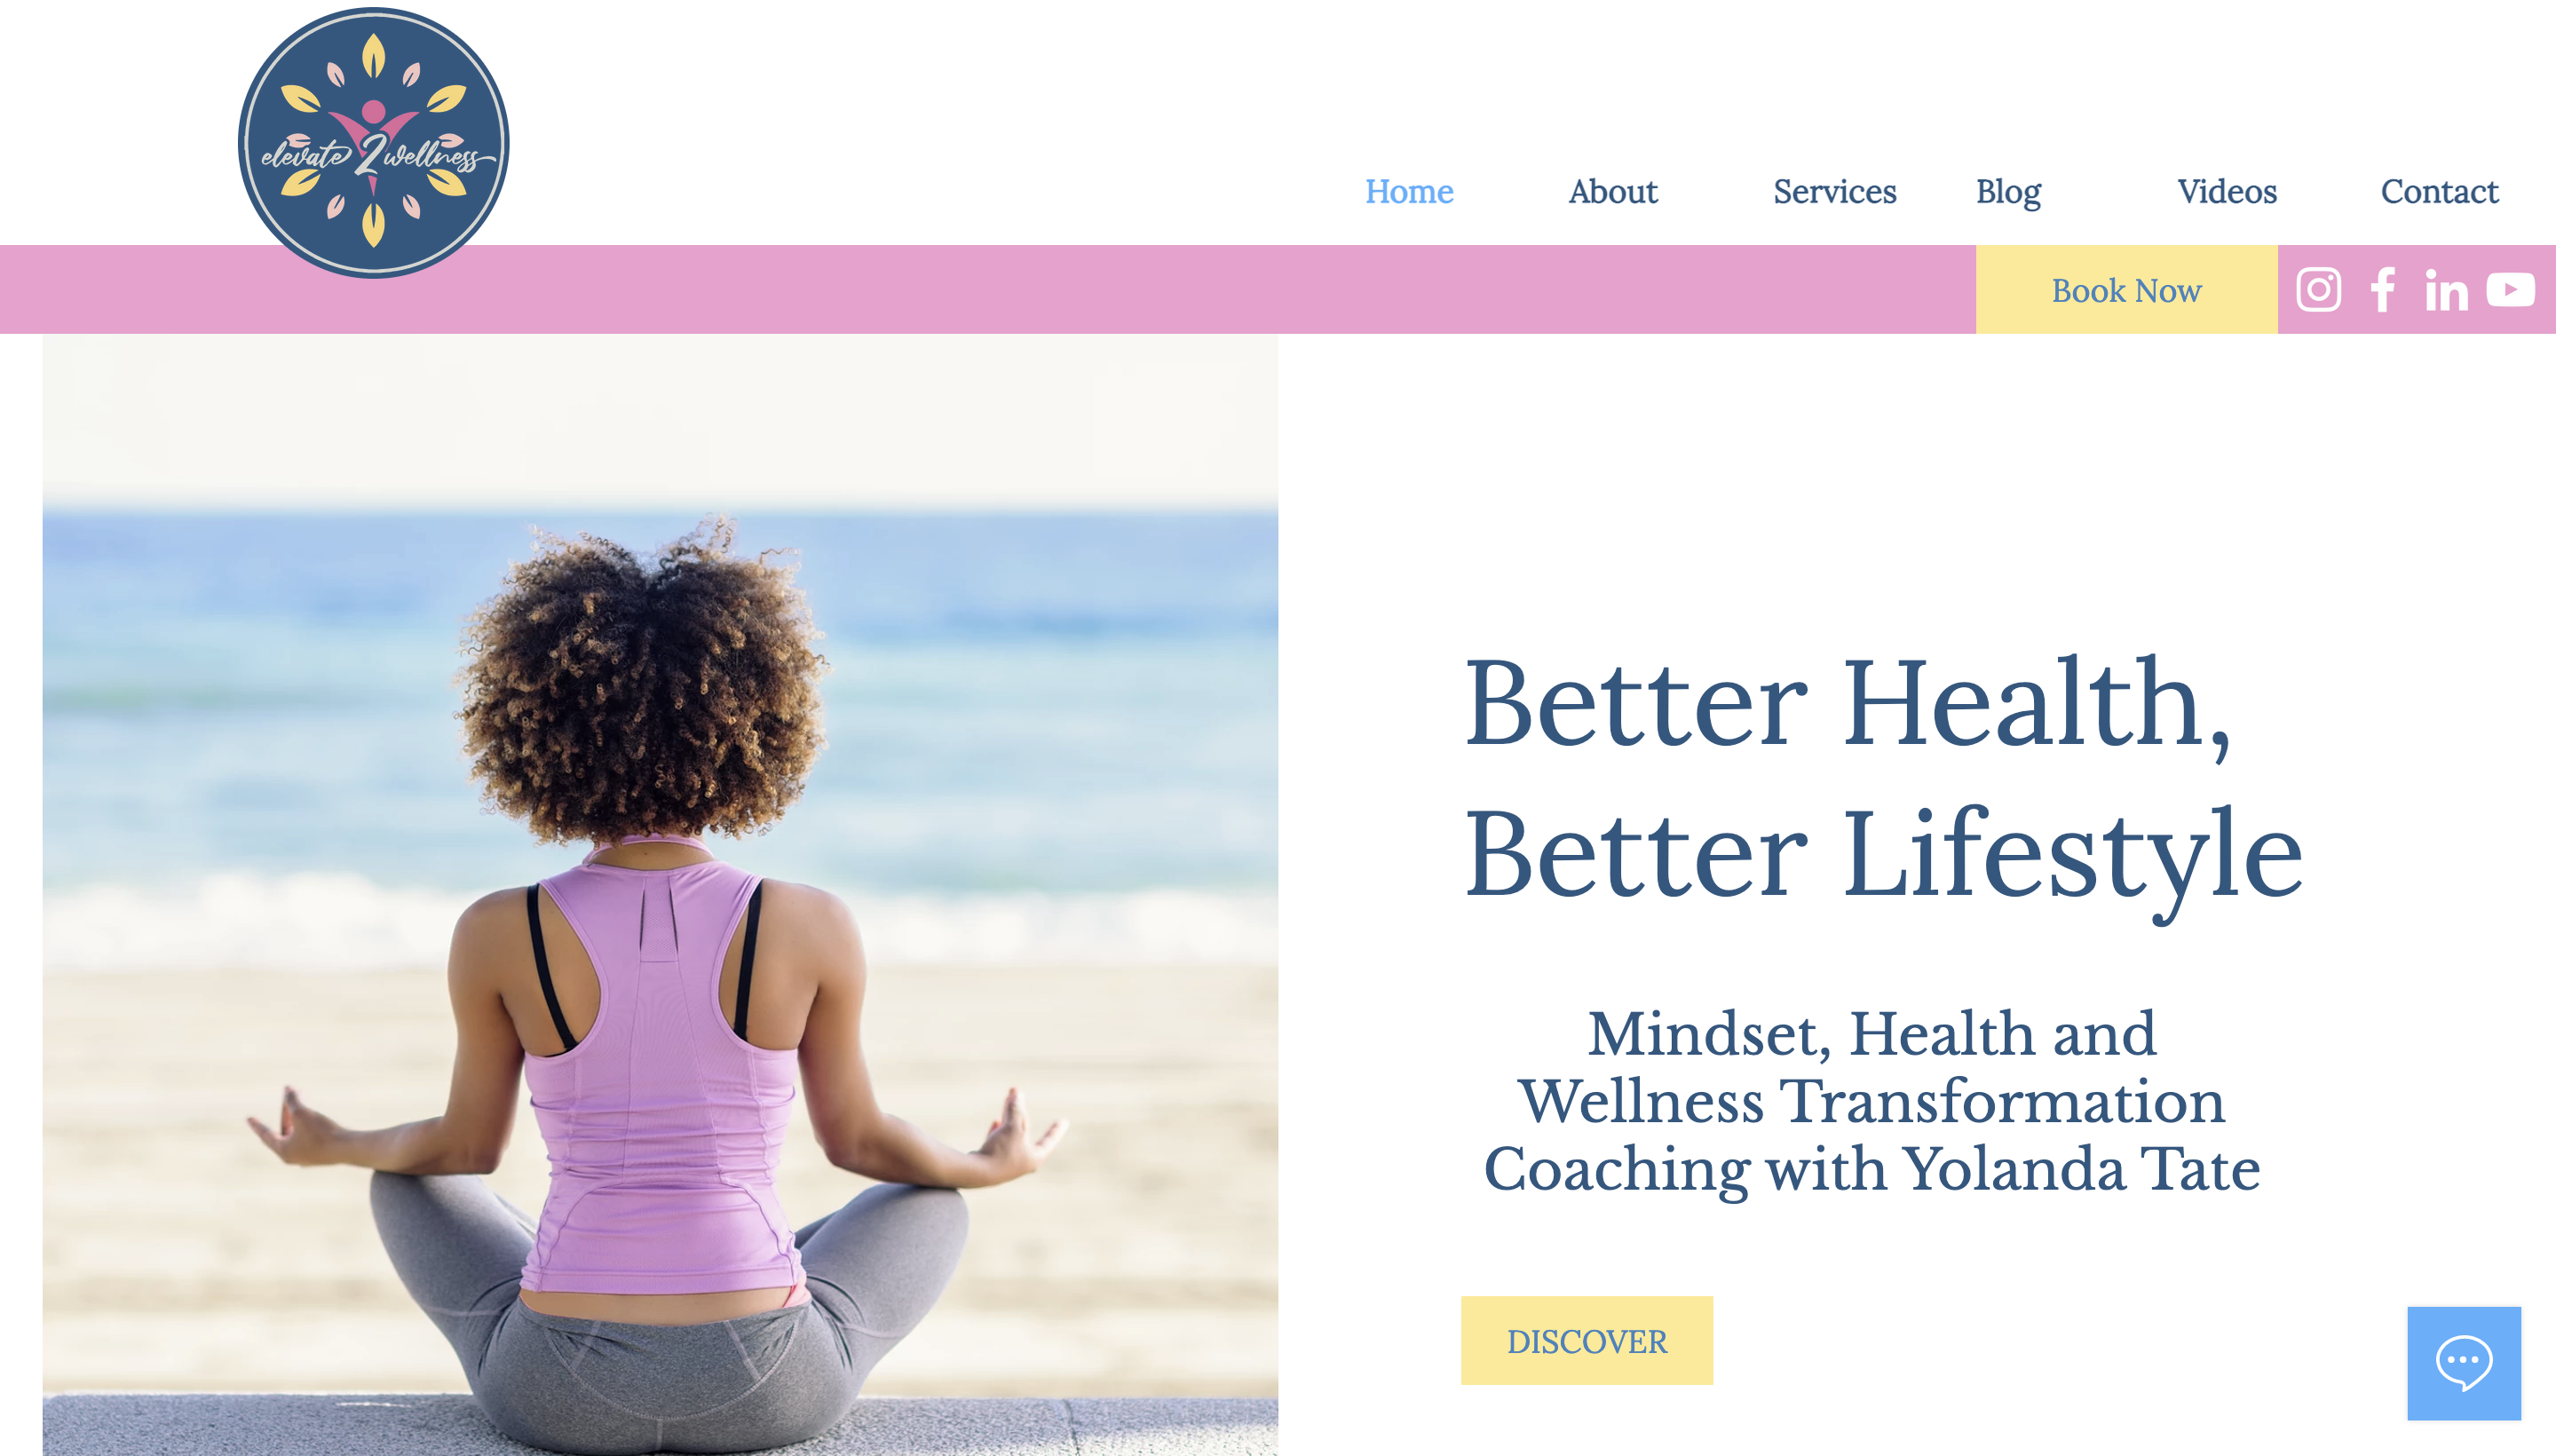 elevate2wellness Mindset, Health and Wellness Transformation Coachi...